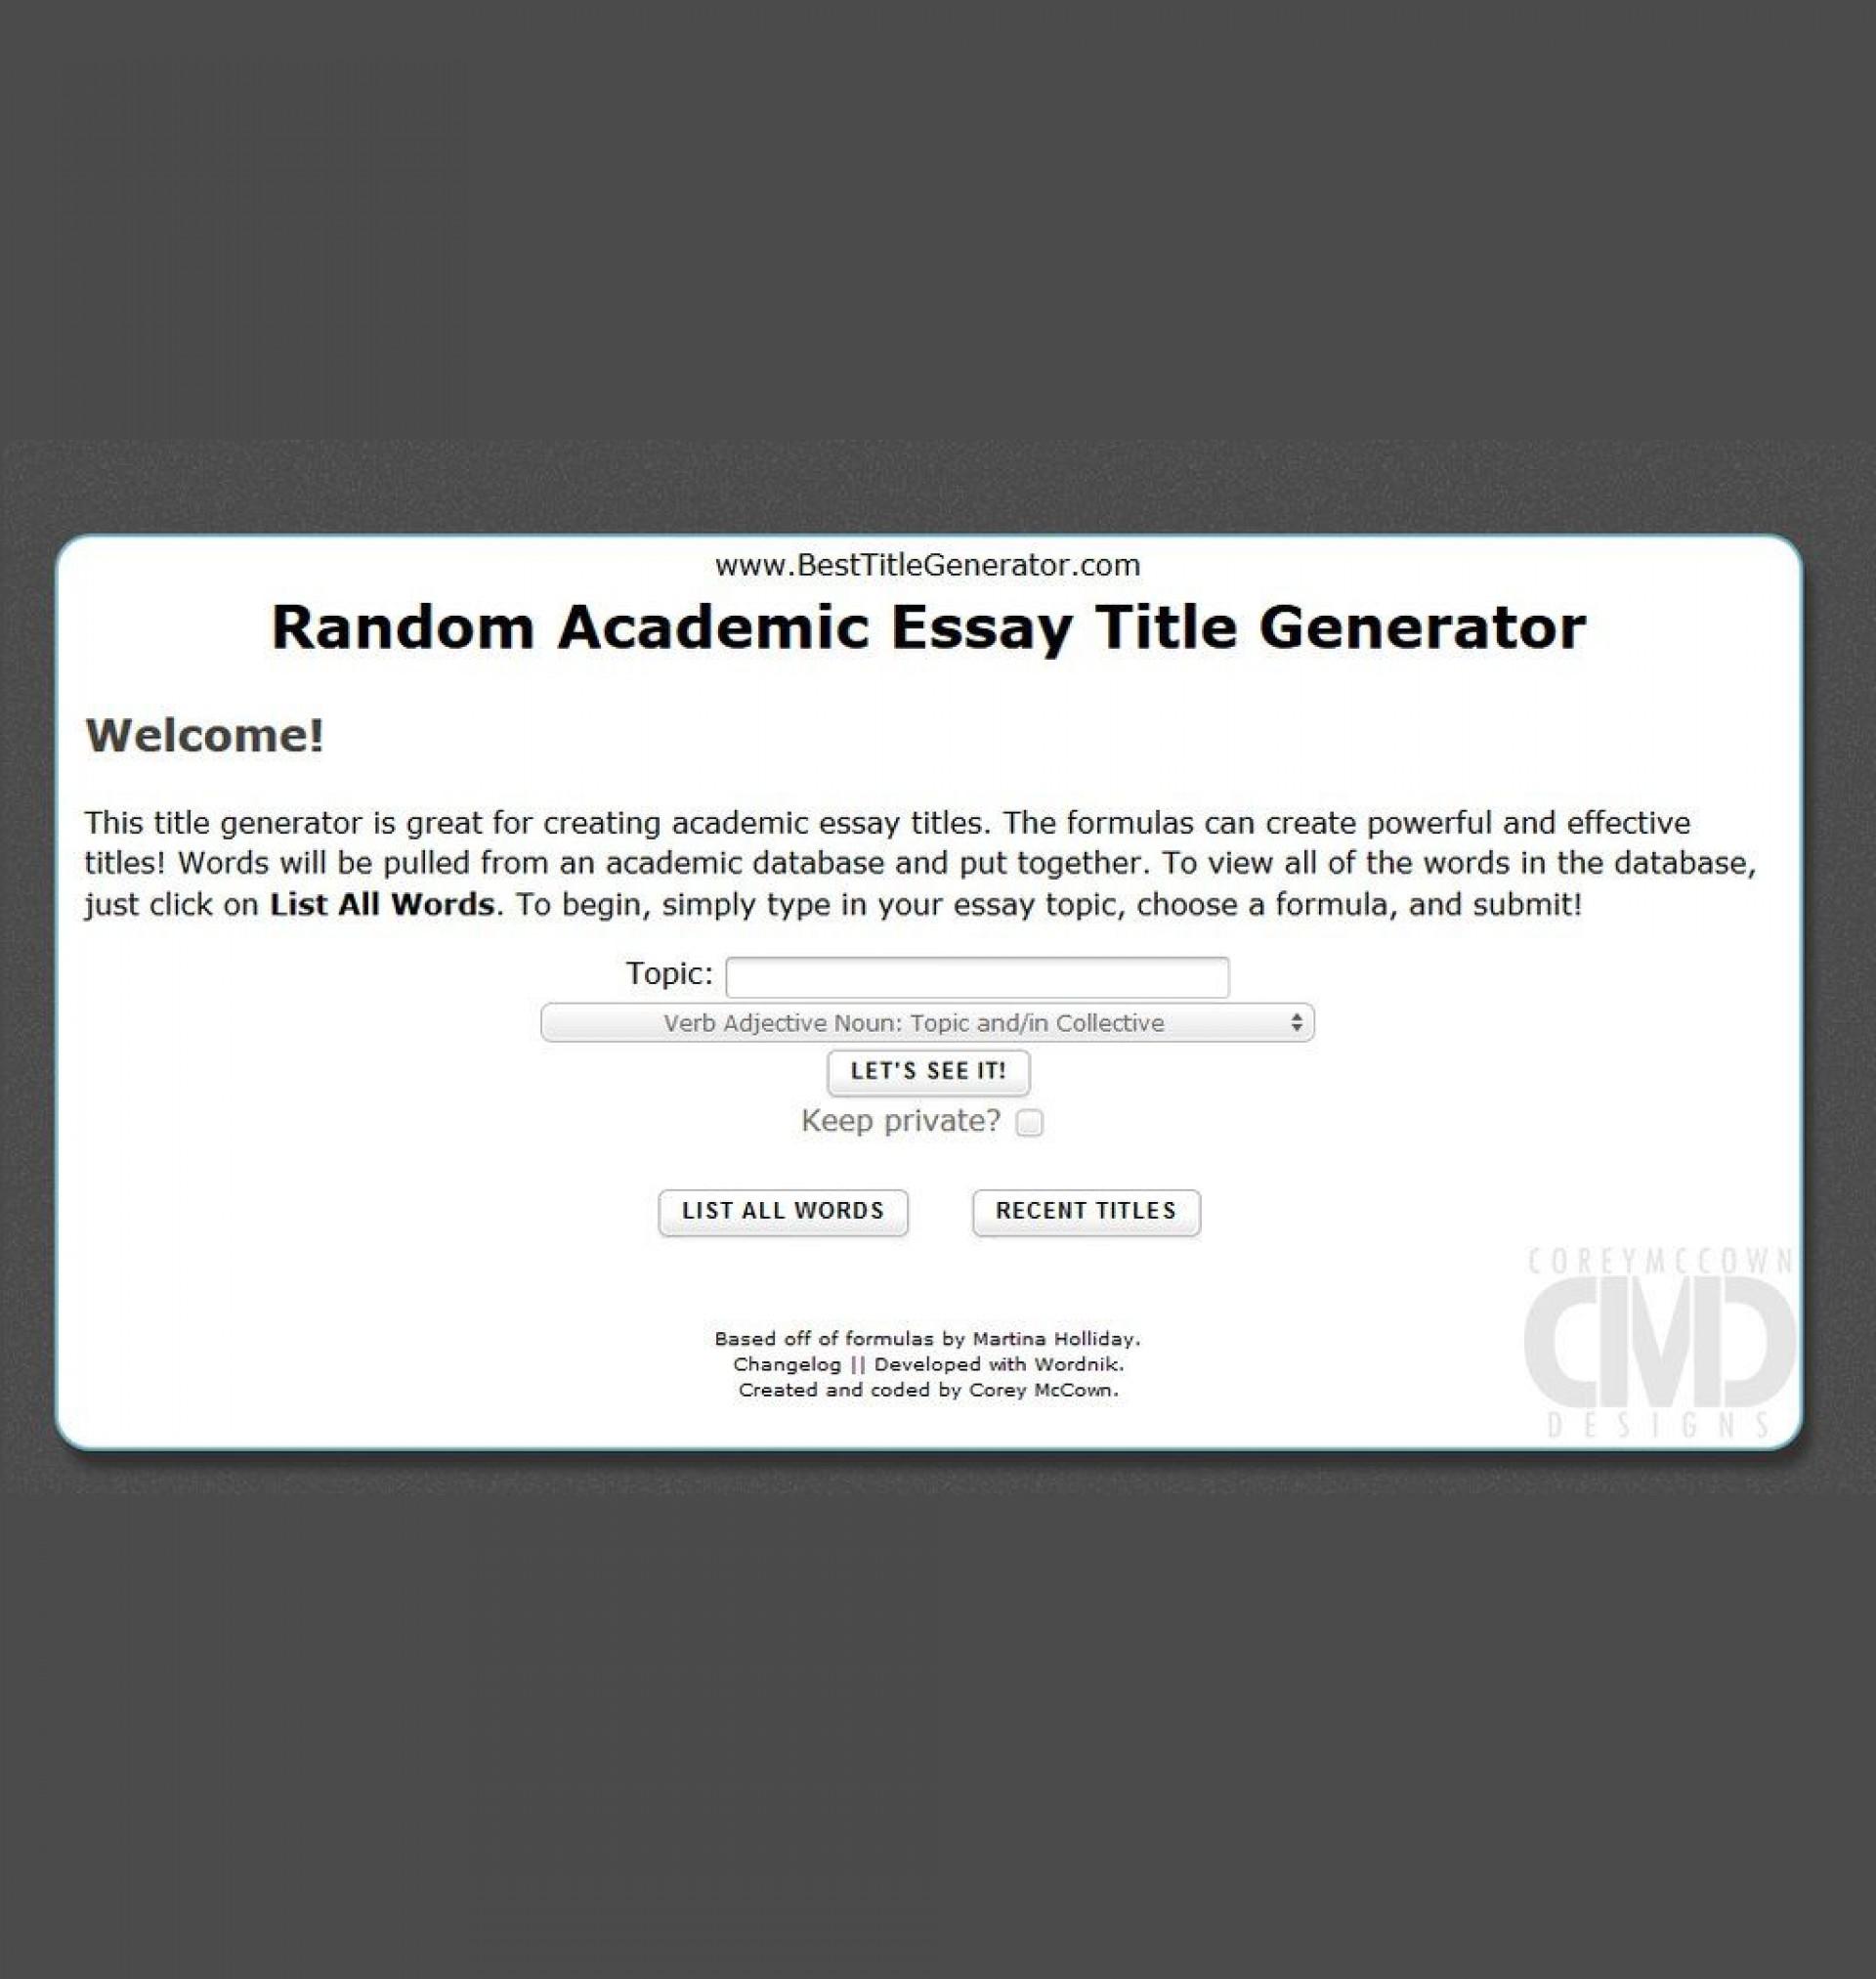 019 Random Essay Generator Stunning Postmodern Prompt 1920